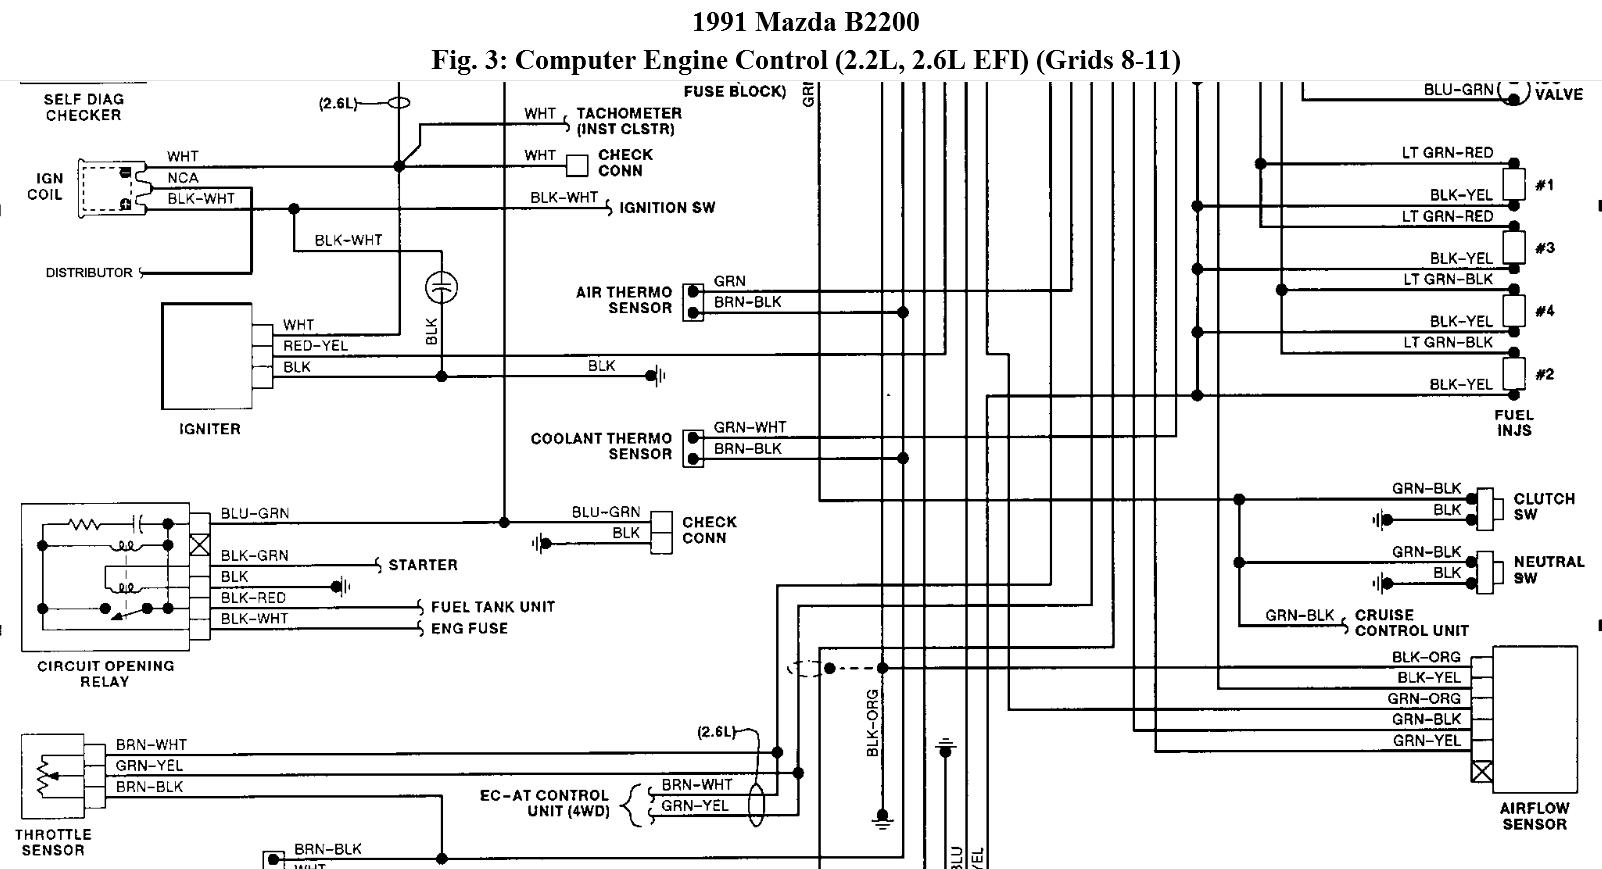 1987 mazda b2000 radio wiring diagram 2006 ford escape door 1991 b2200 engine auto